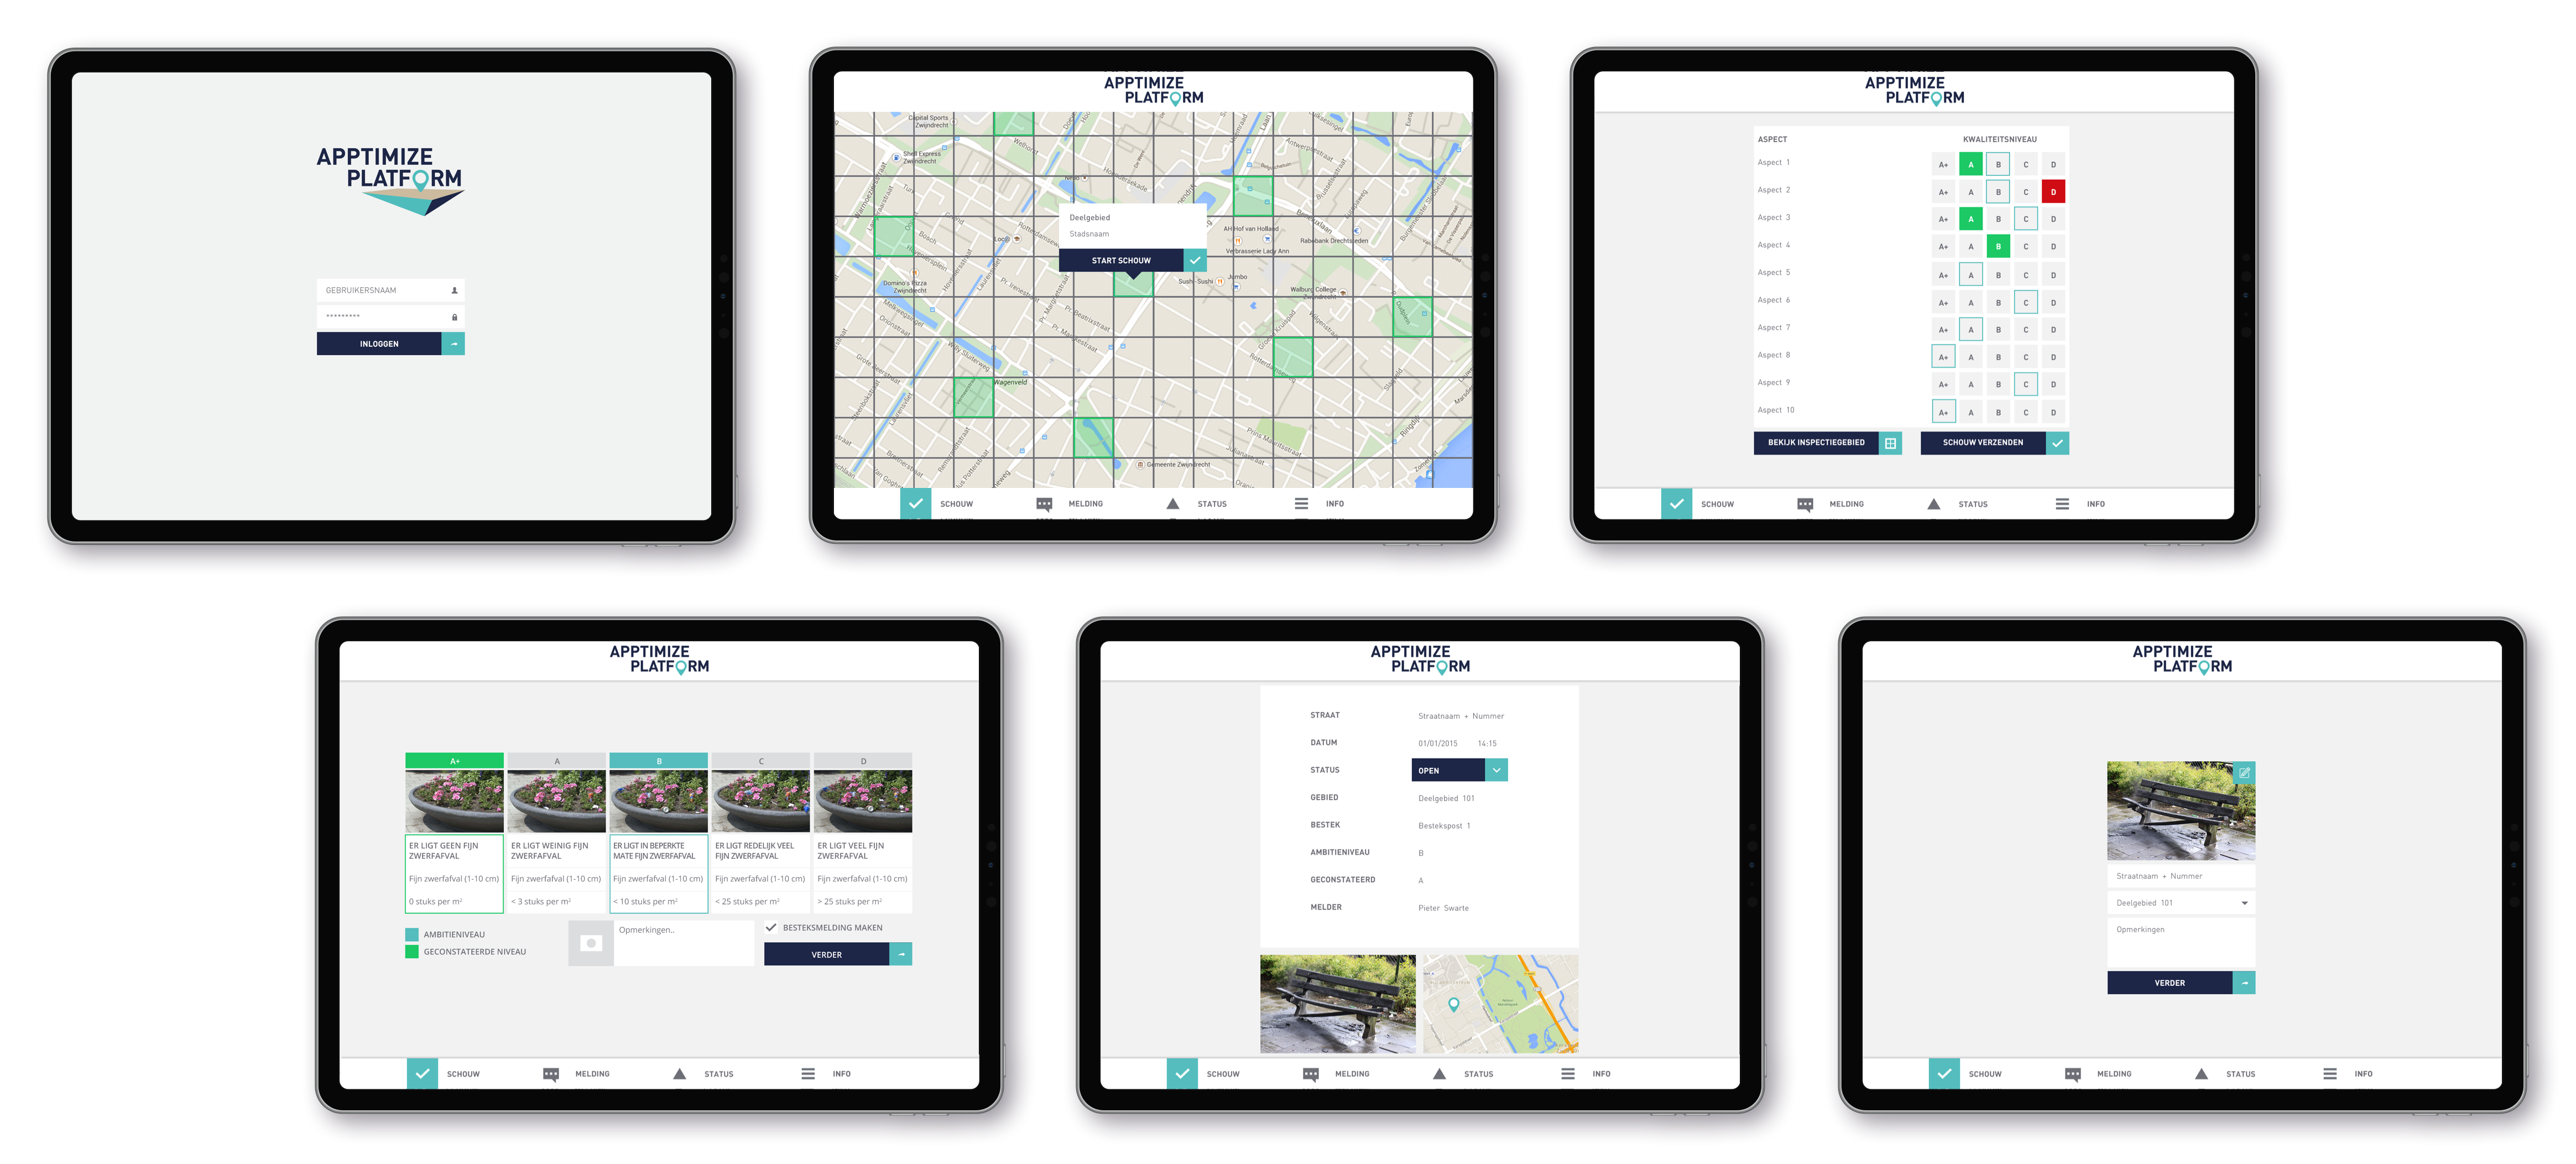 Apptimize Platform iPad app